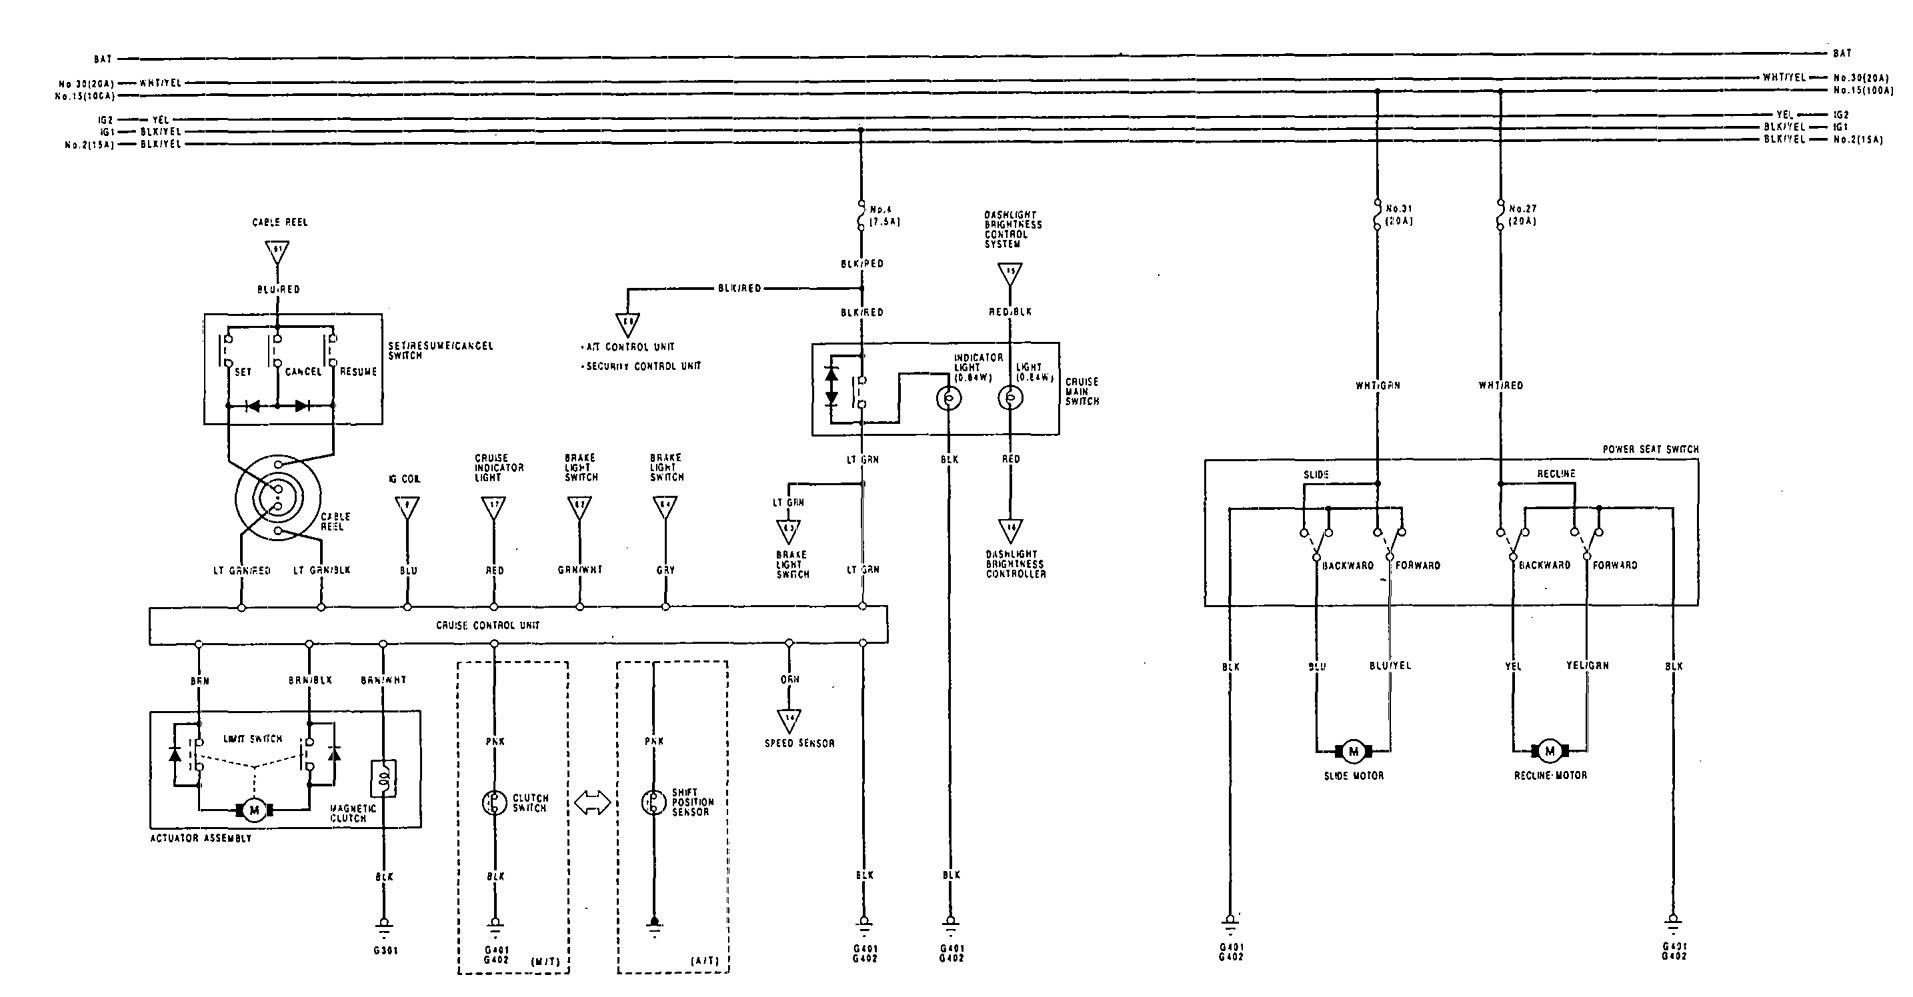 Acura Vigor Wiring Diagram : Acura vigor wiring diagrams speed controls